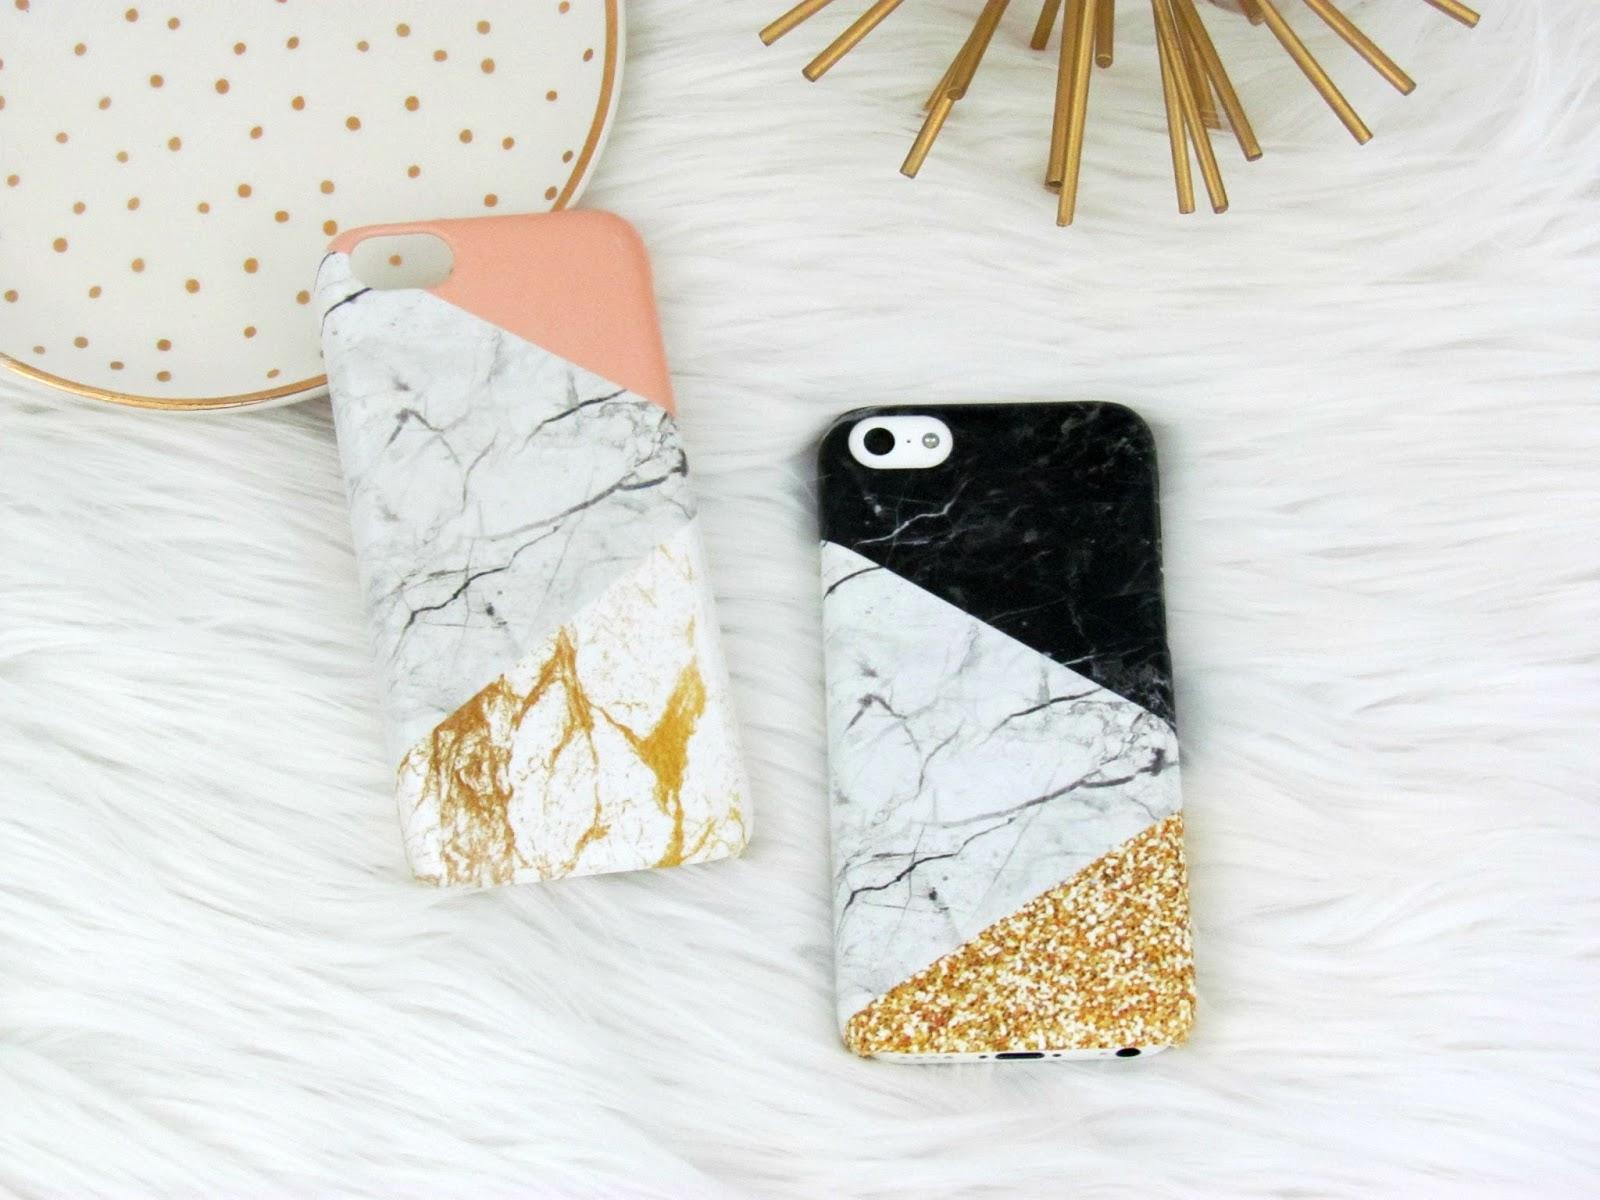 Favorite Cell Phone Apps & Custom Case